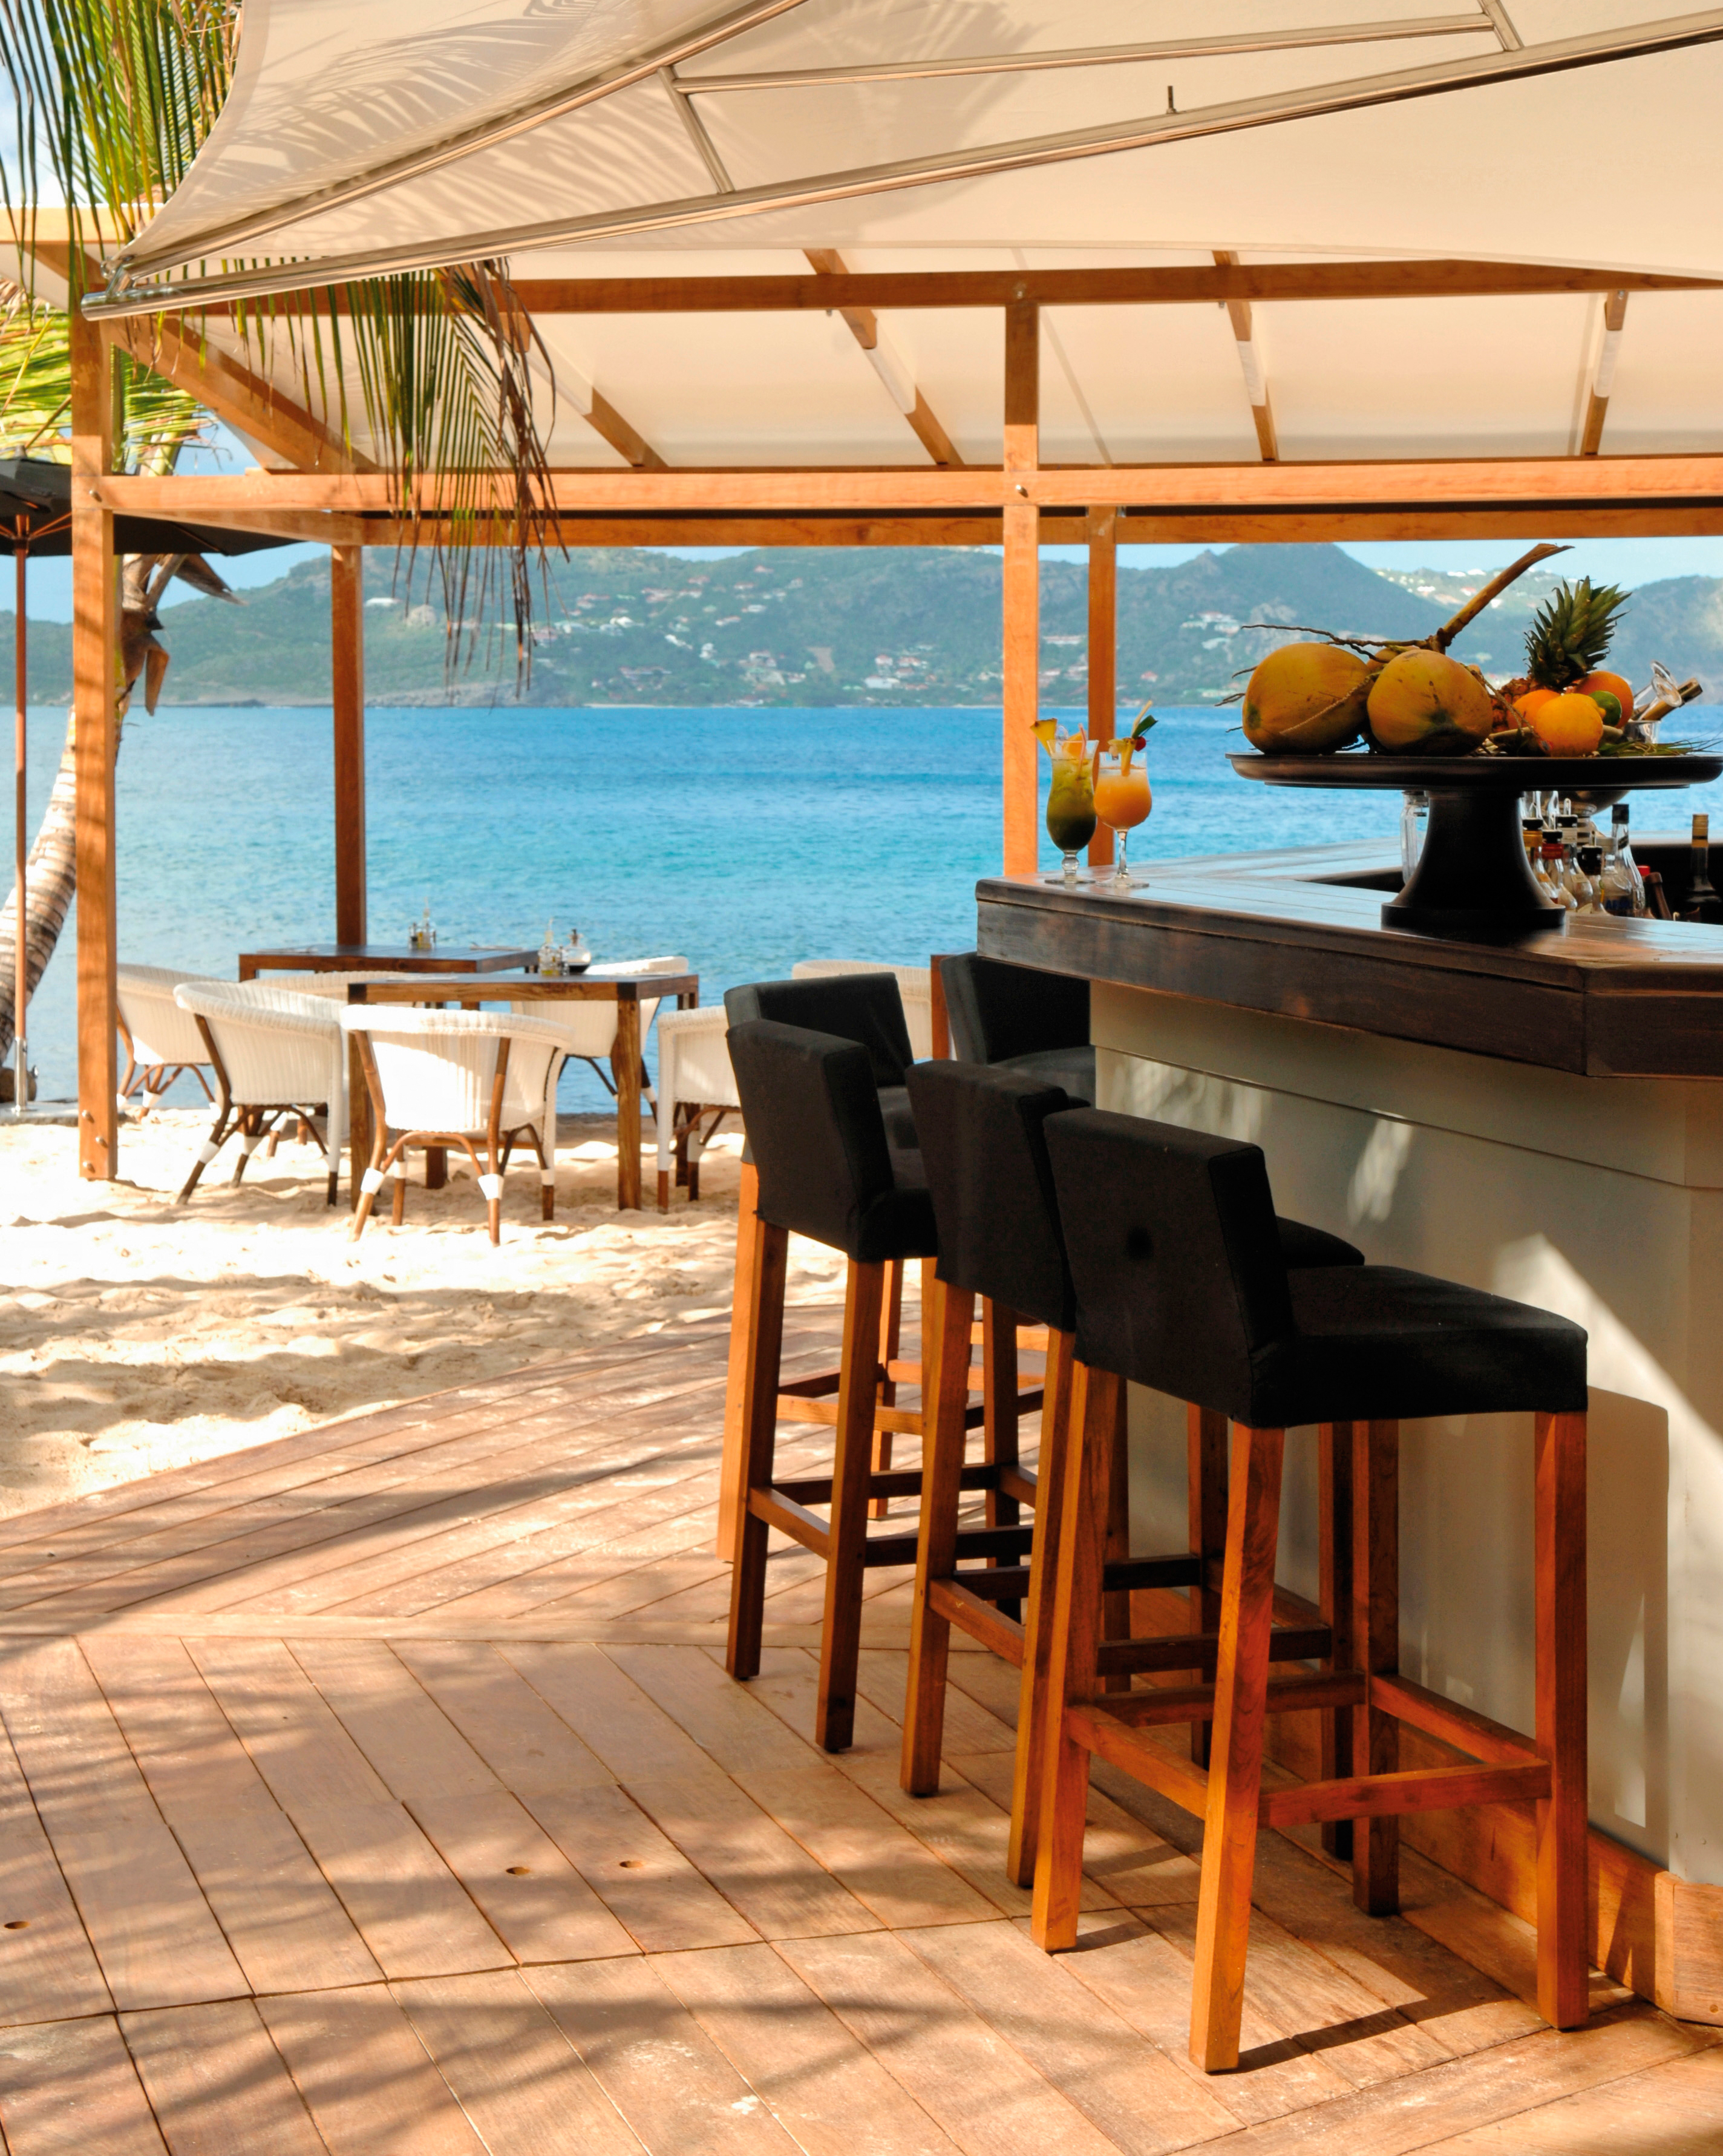 honeymoon-destinations-2015-st-barths-hotel-christopher-bar-0115.jpg